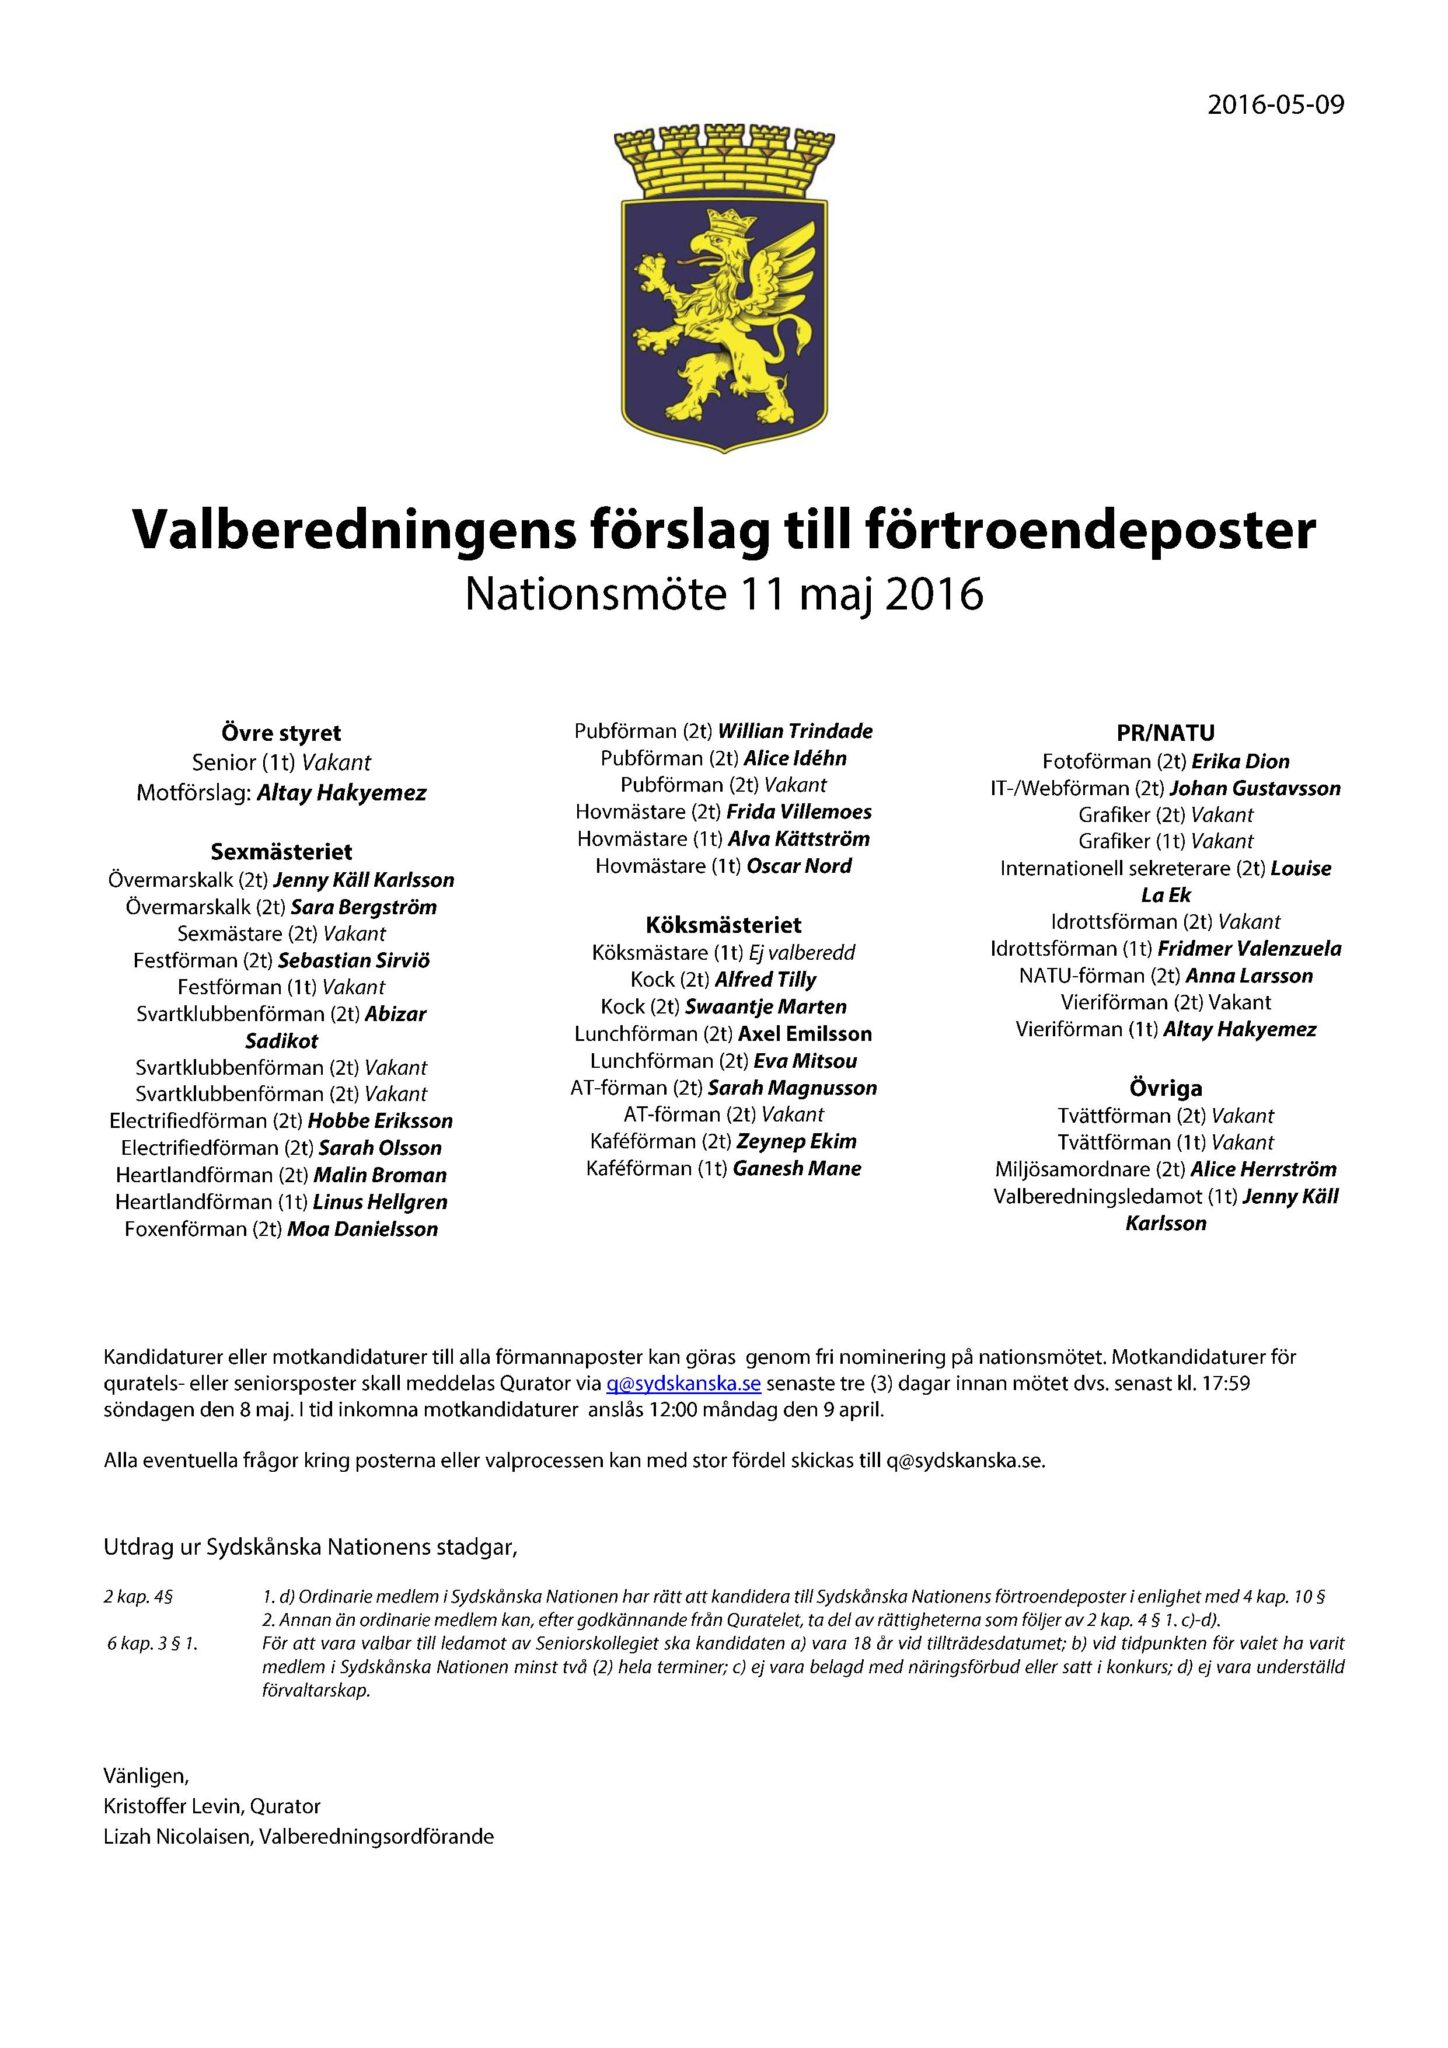 Motkandidaturer 2016-05-11